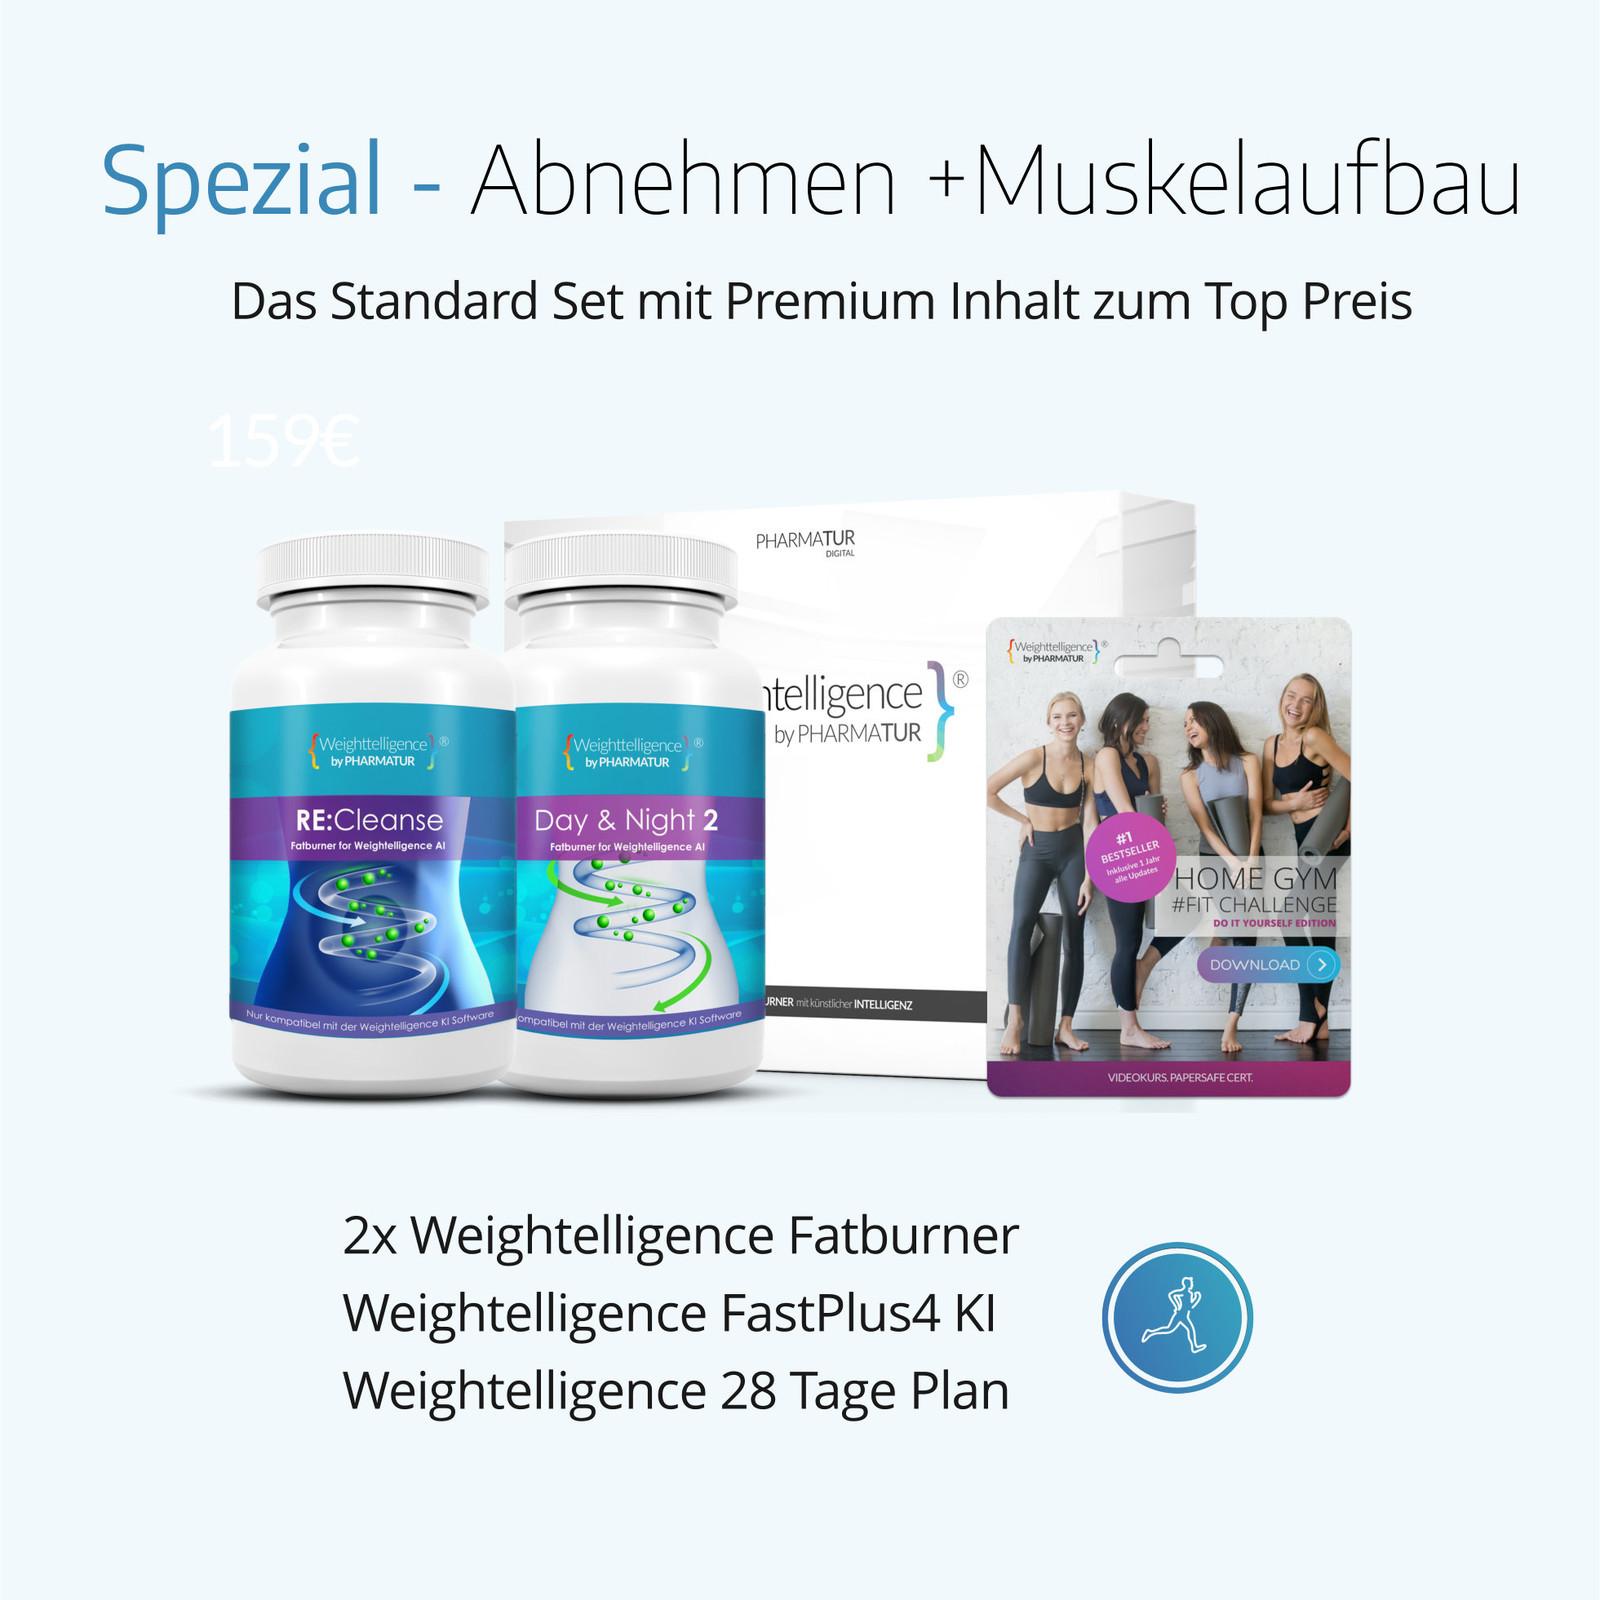 Weightelligence Weightelligence® Spezial - Abnehmen +Muskelaufbau (Inklusive 2x WT Fatburner, Bodyfit Programm & Fatburn KI)